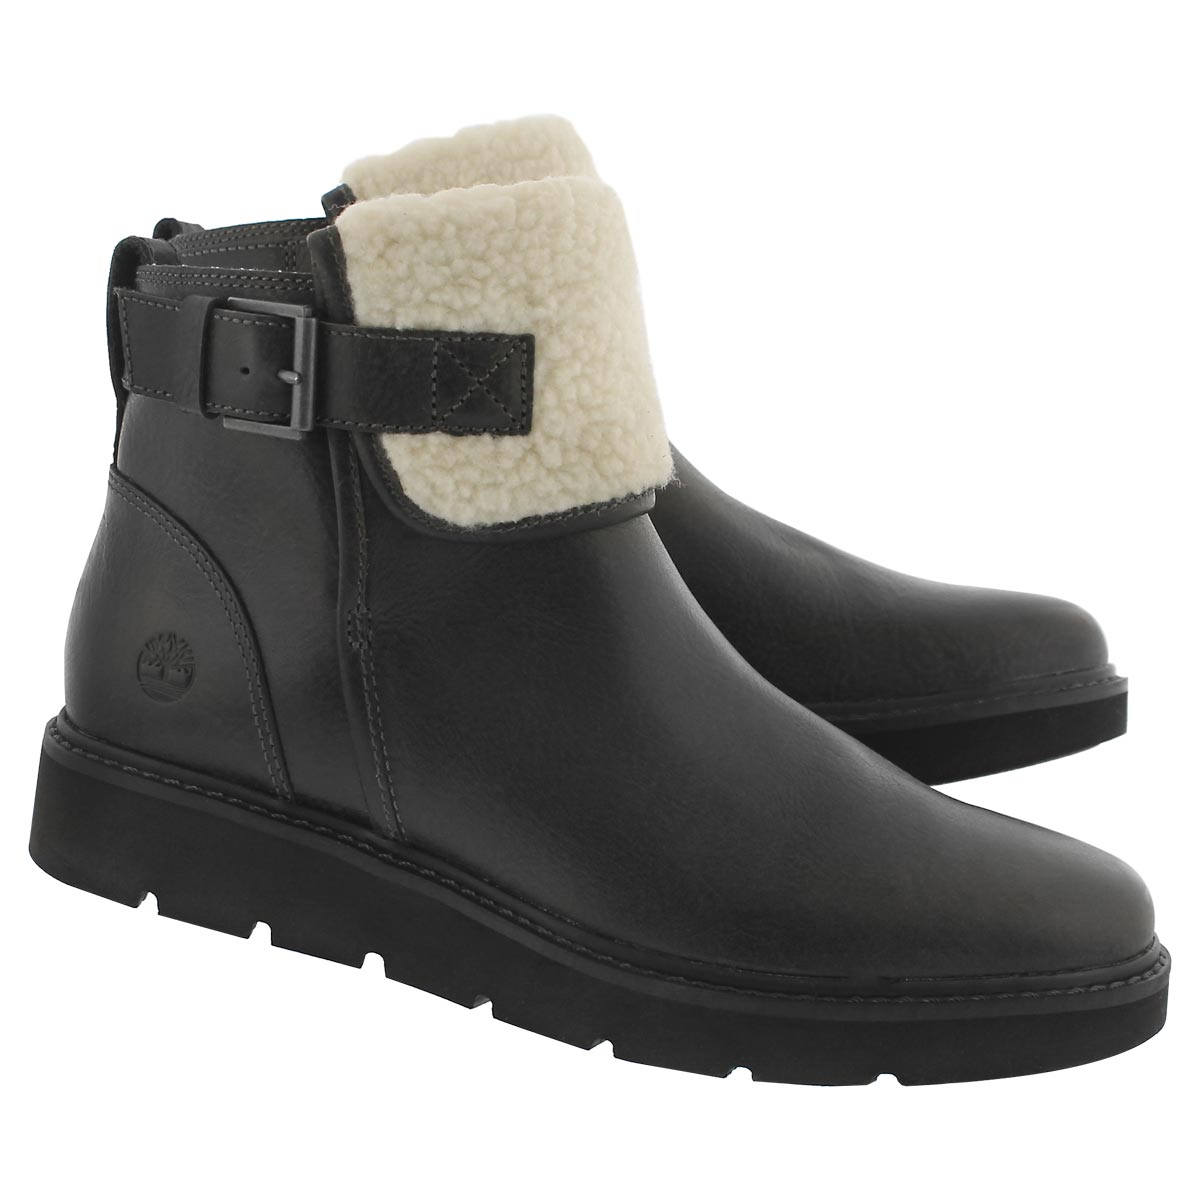 Lds Kenniston dk grey slip on ankle boot